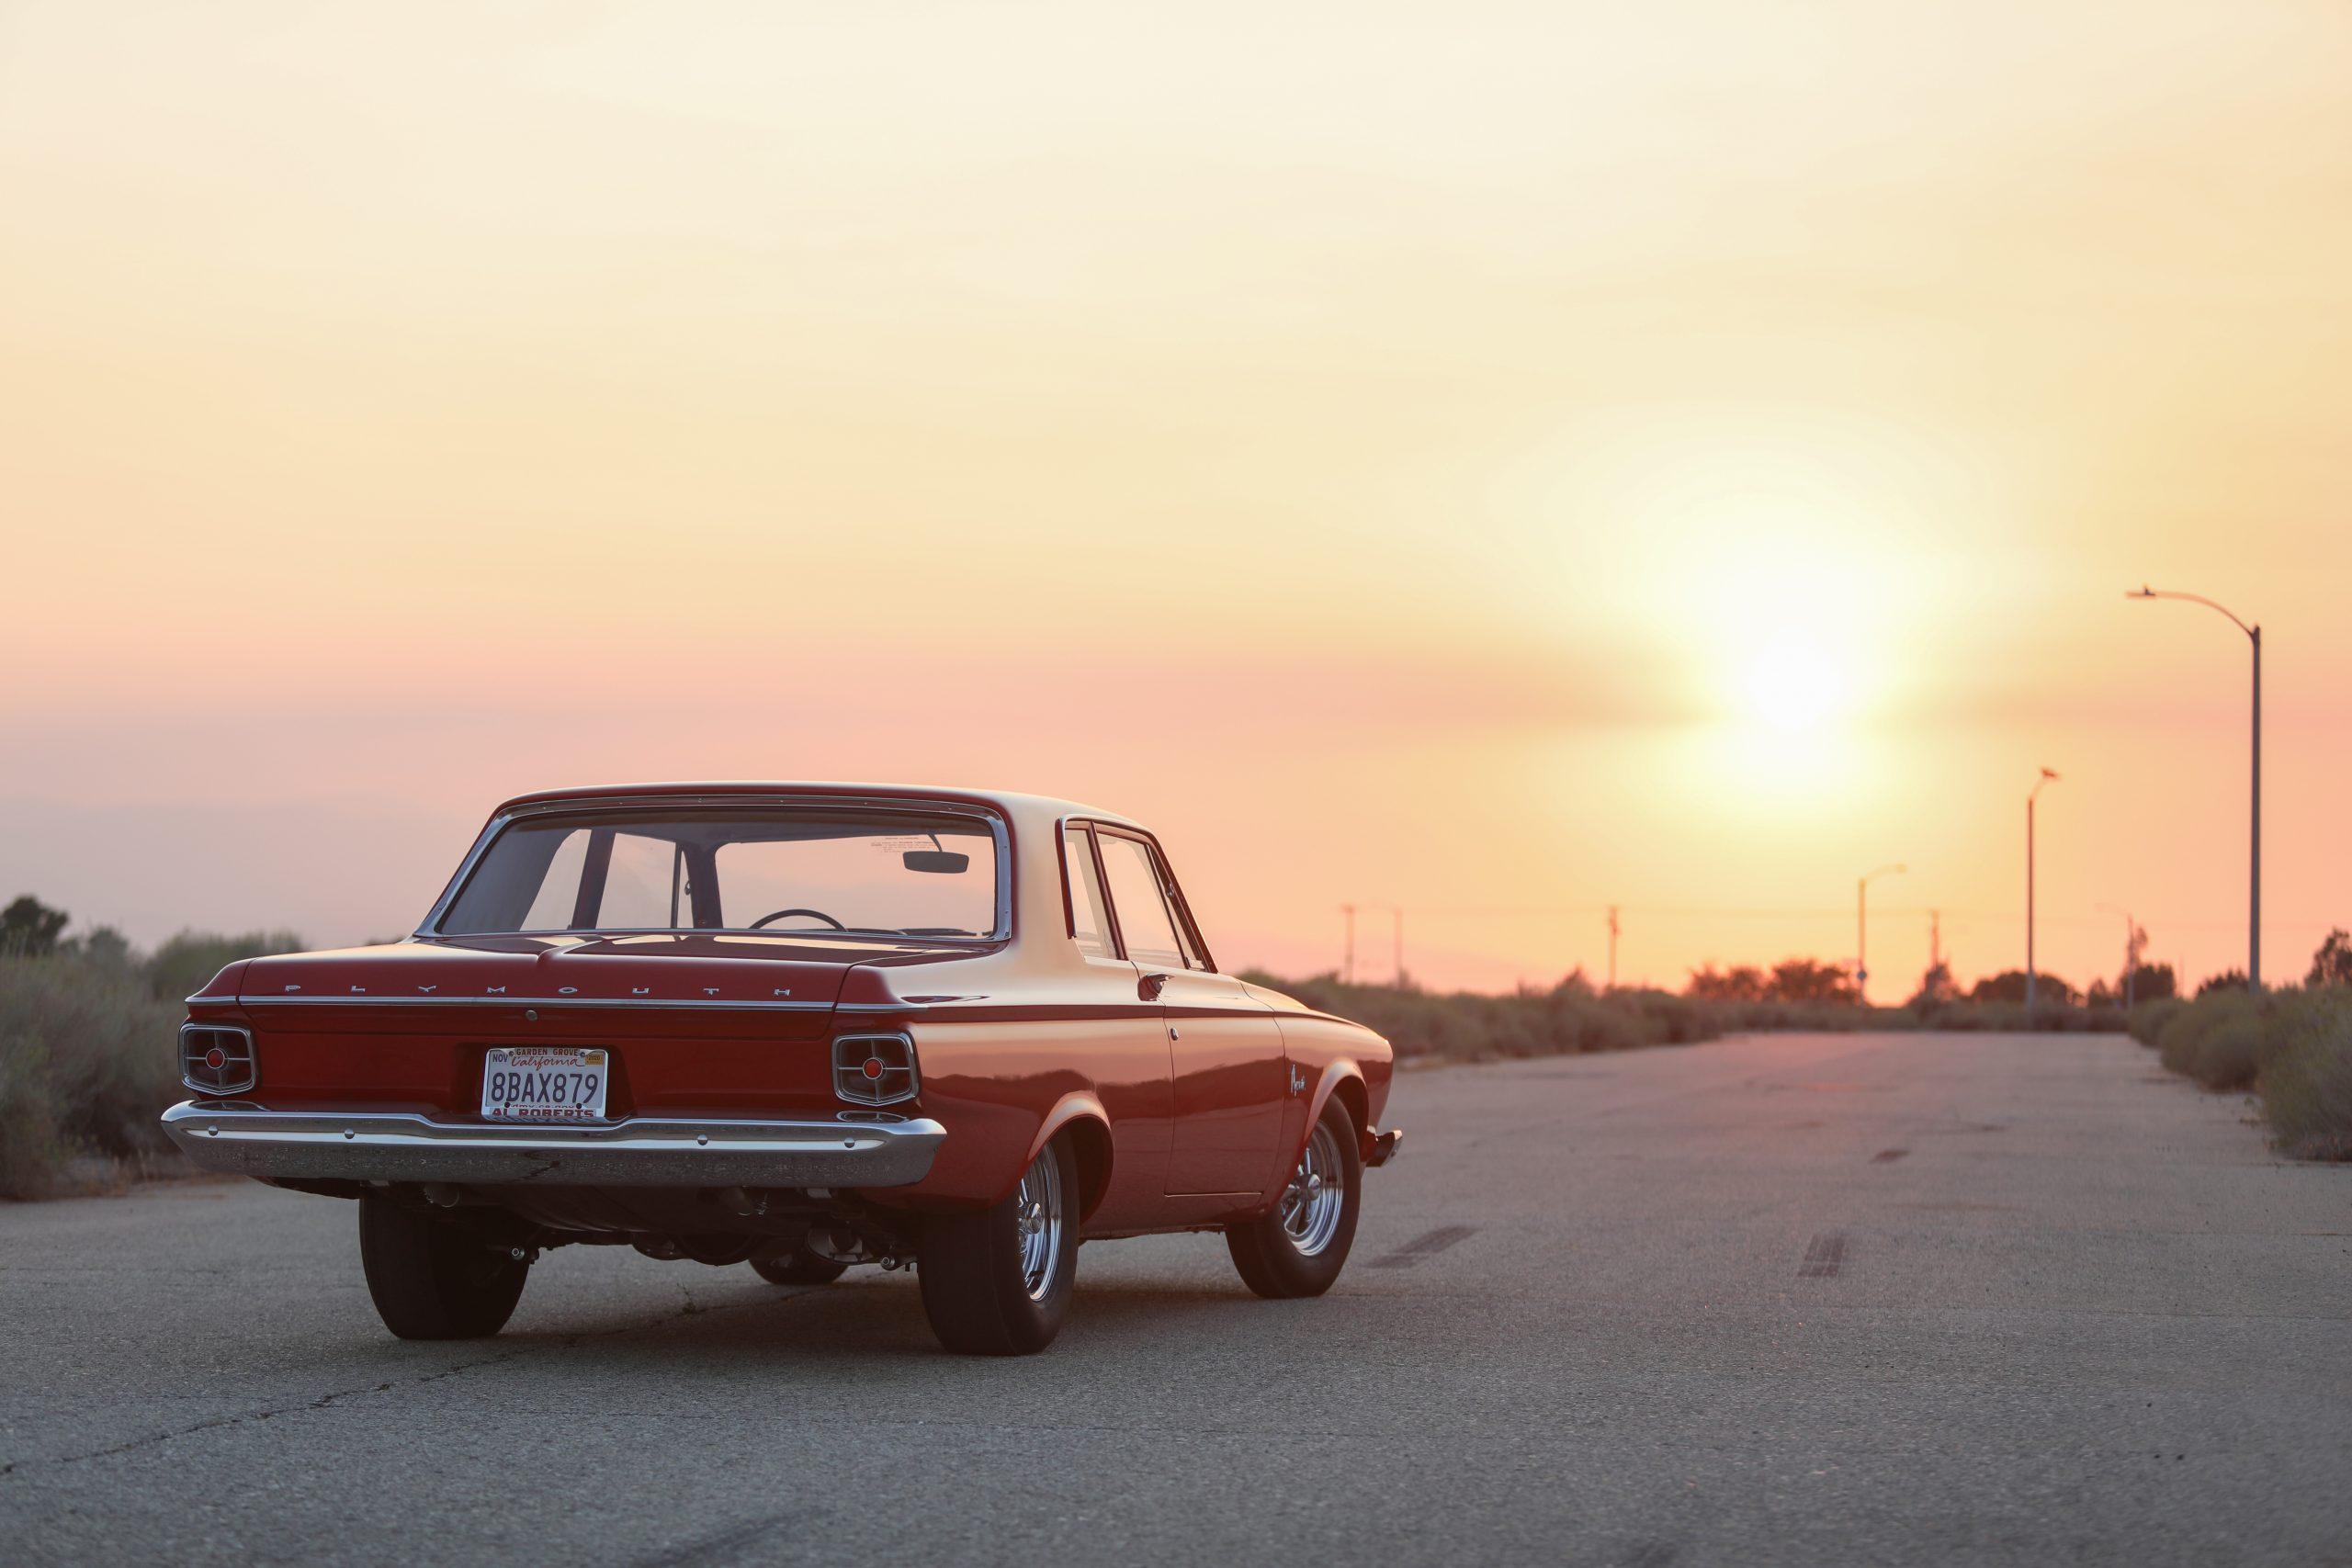 1963 Plymouth 426 Max Wedge lightweight rear three-quarter